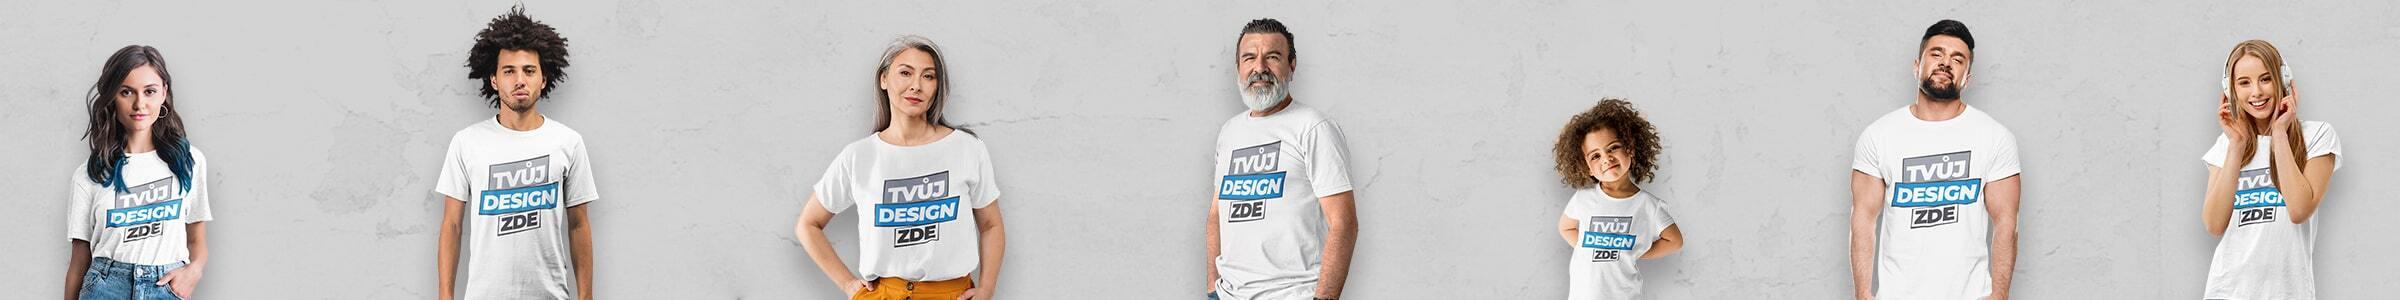 Category_Teaser_Header_T_Shirts_CZ_2400x300